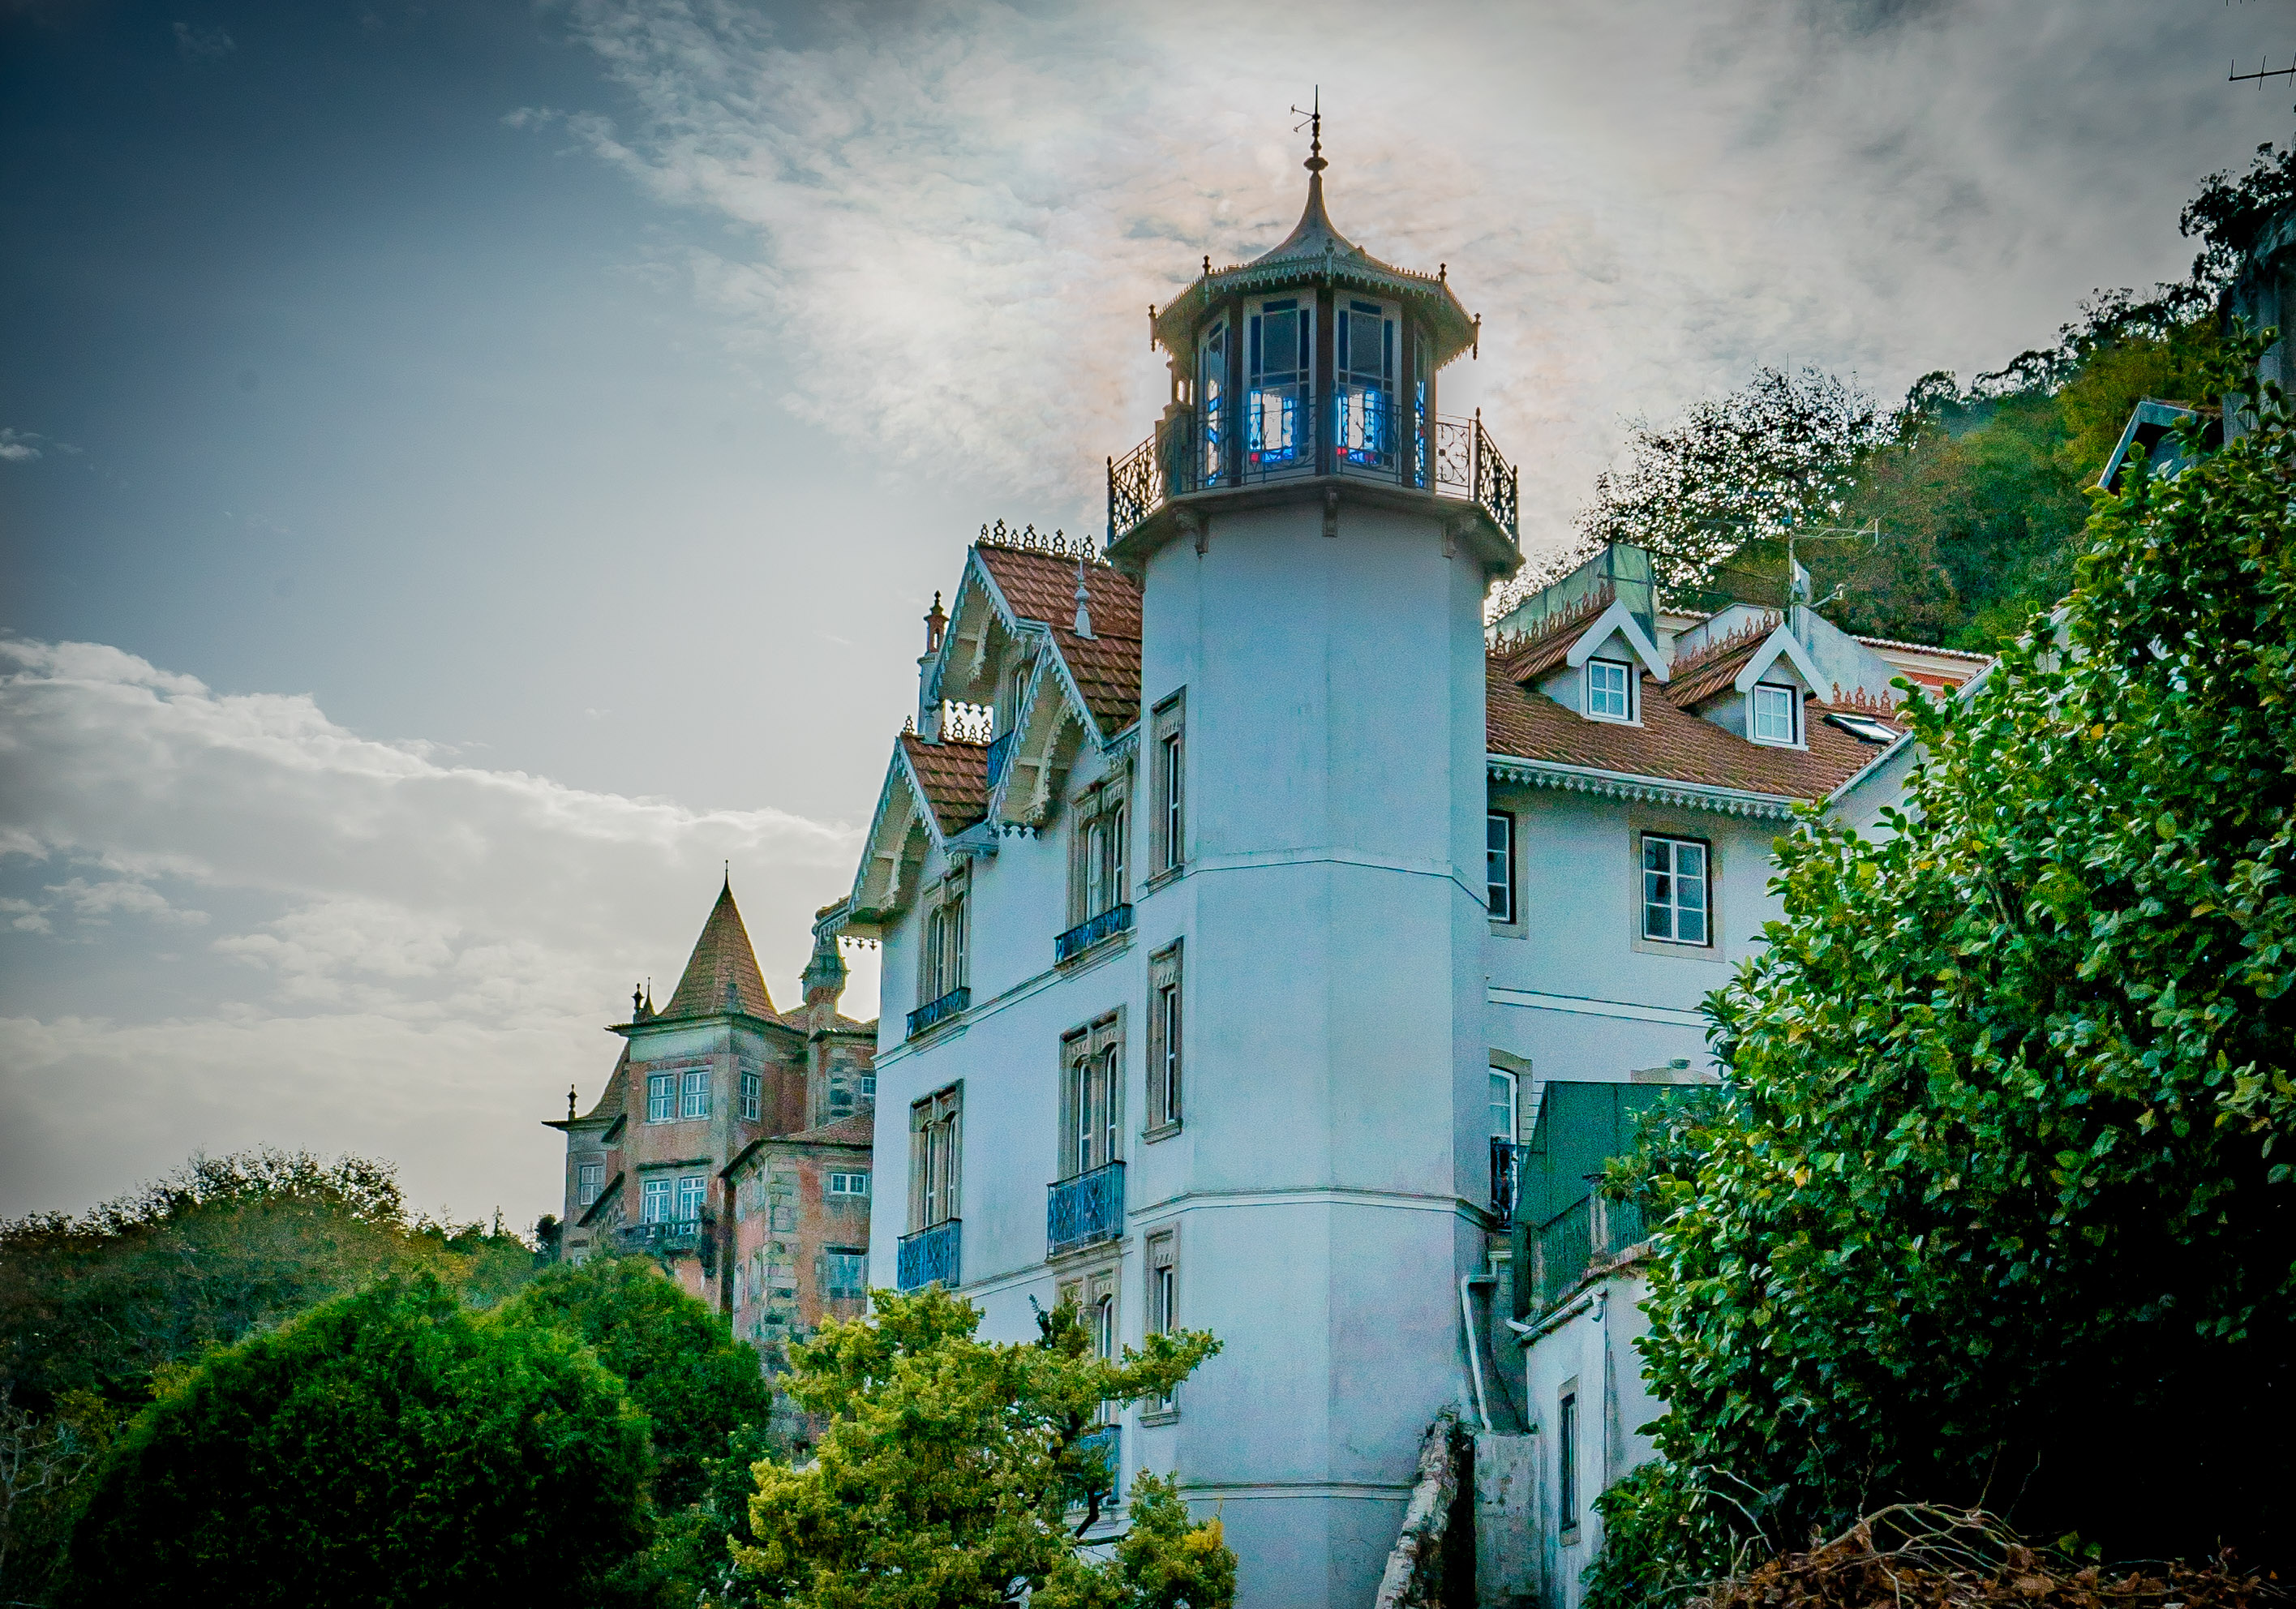 Sintra Tower